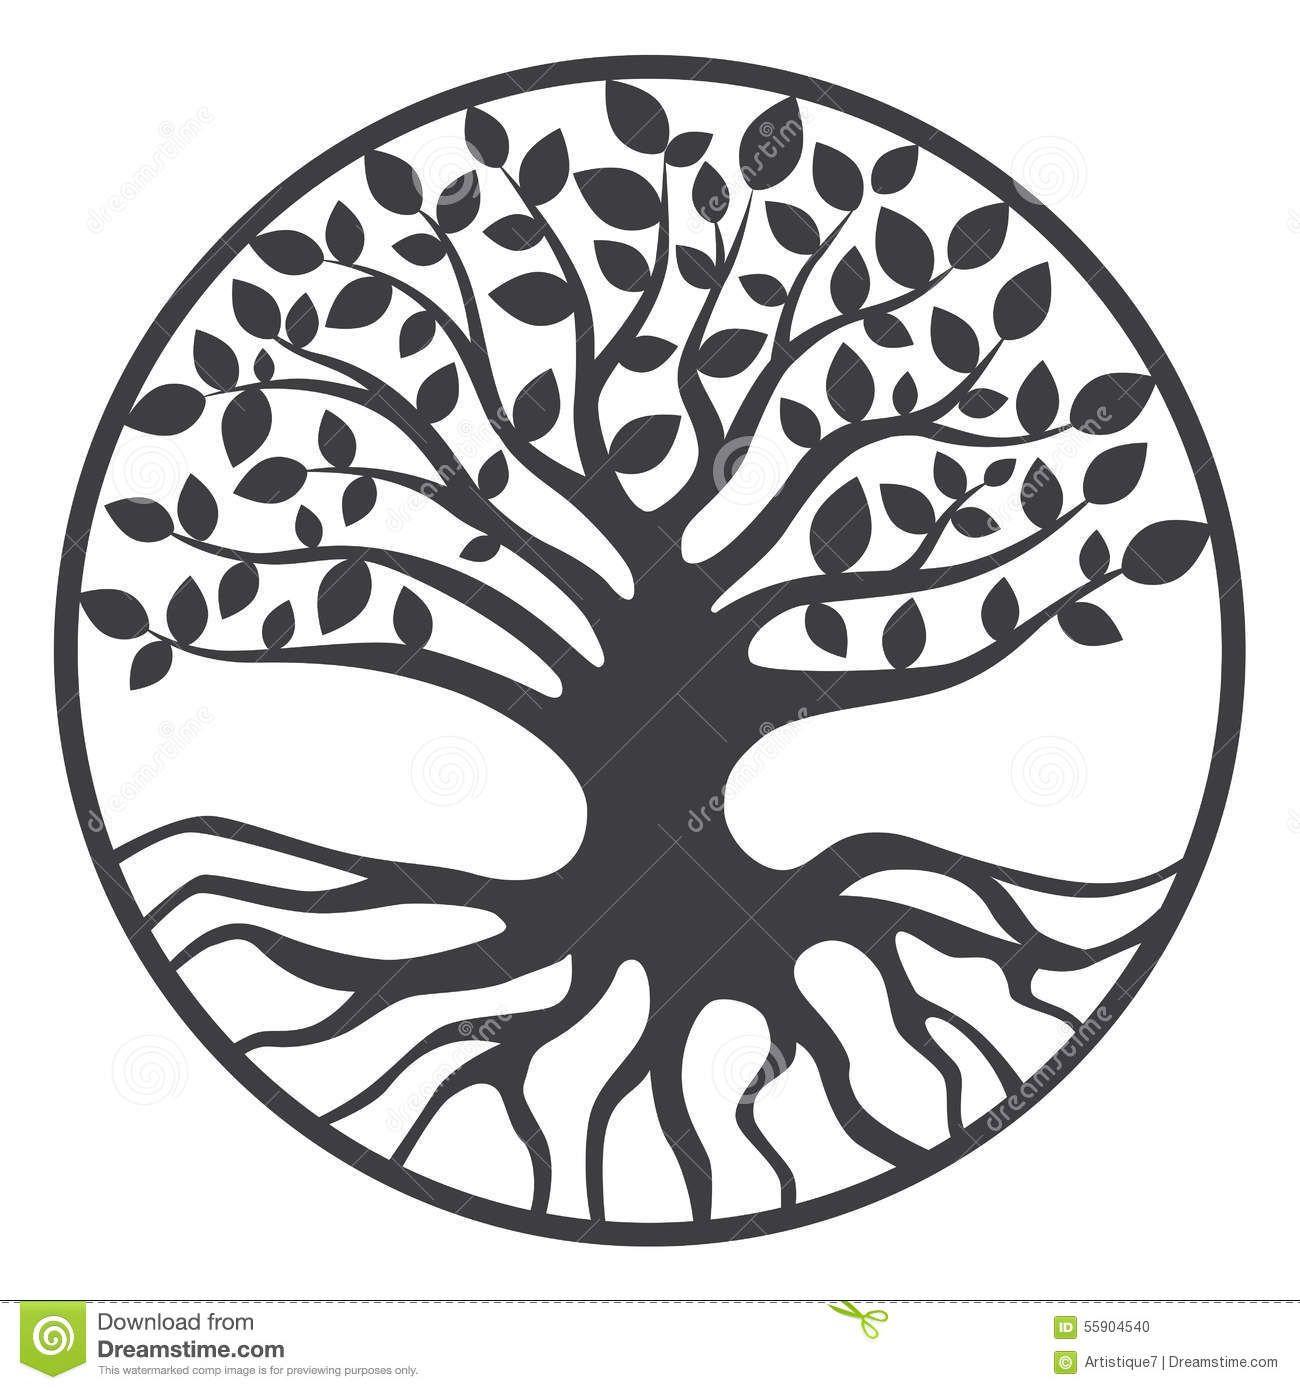 medium resolution of tree of life royalty free stock photography image 18184847